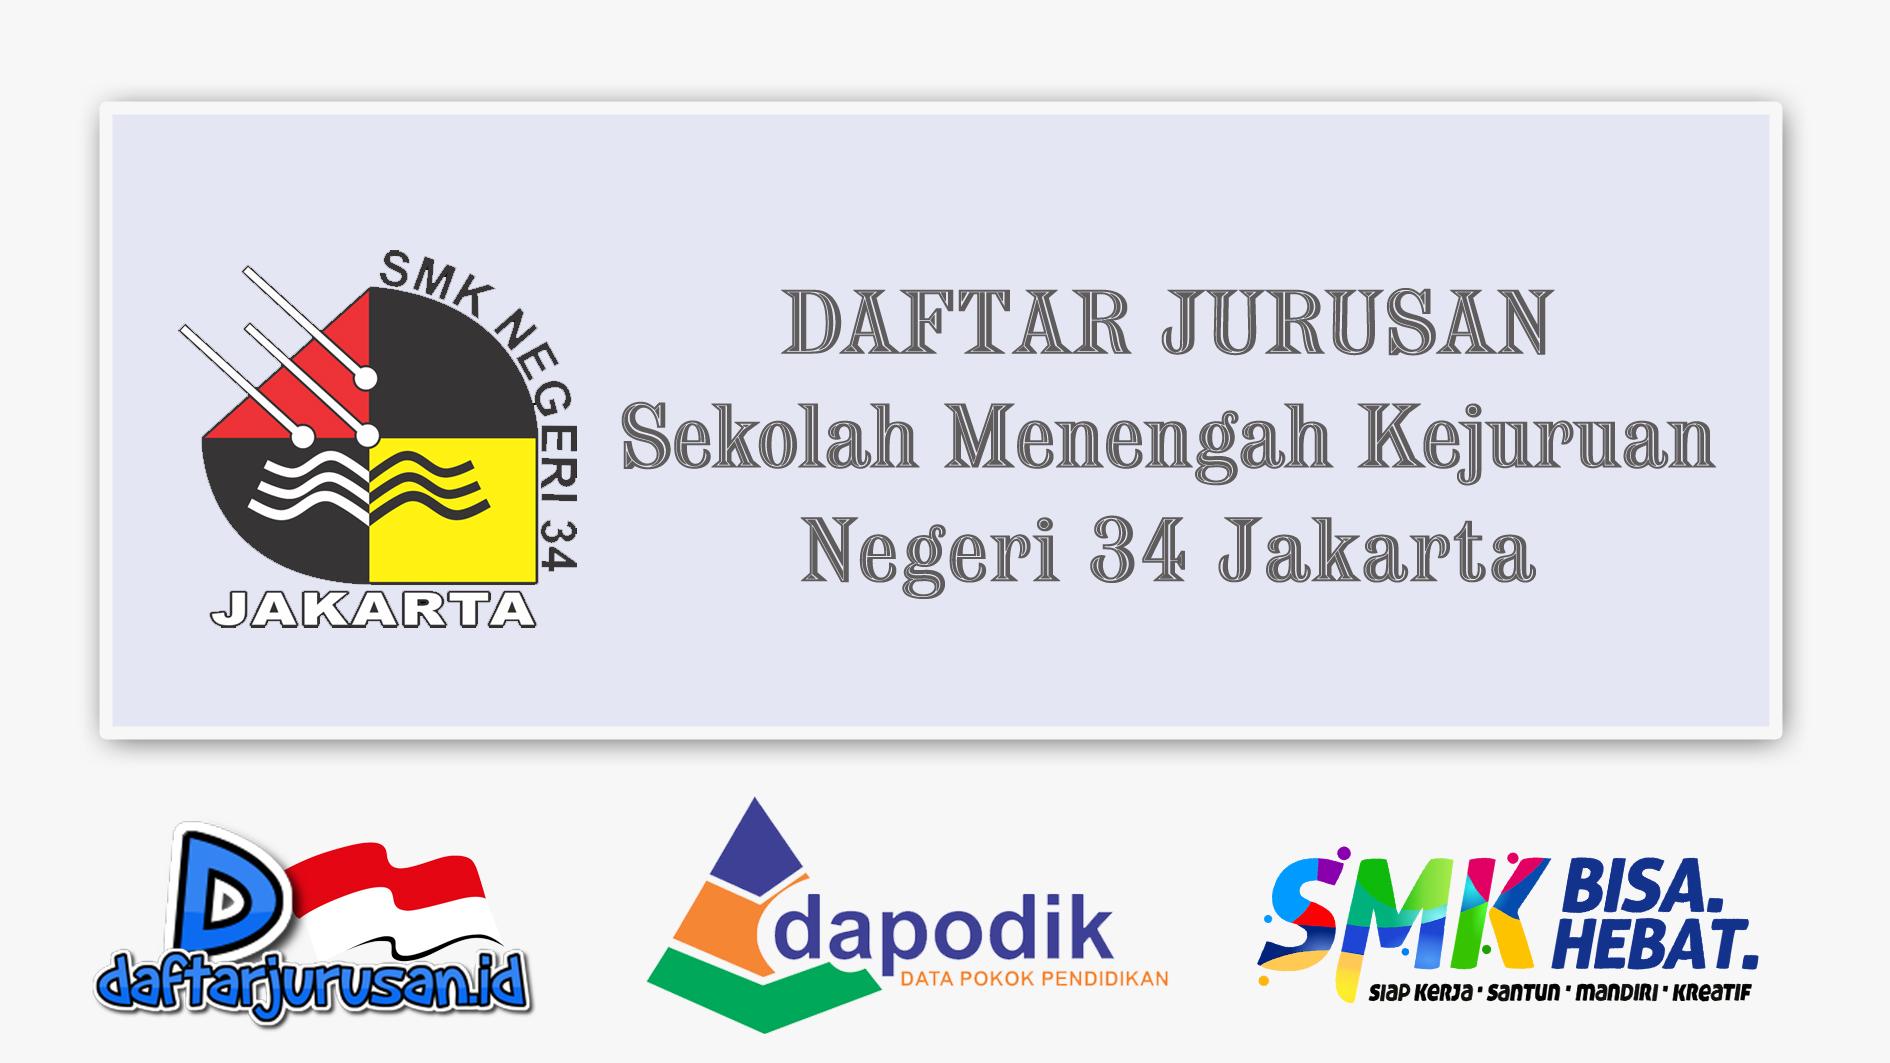 Daftar Jurusan SMK Negeri 34 Jakarta Pusat